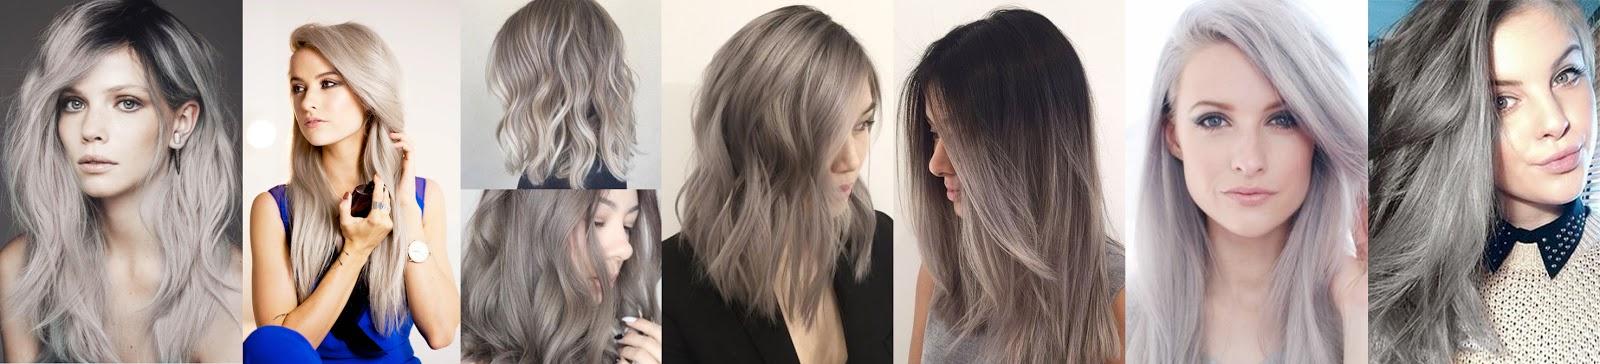 Cheveux chatain clair gris